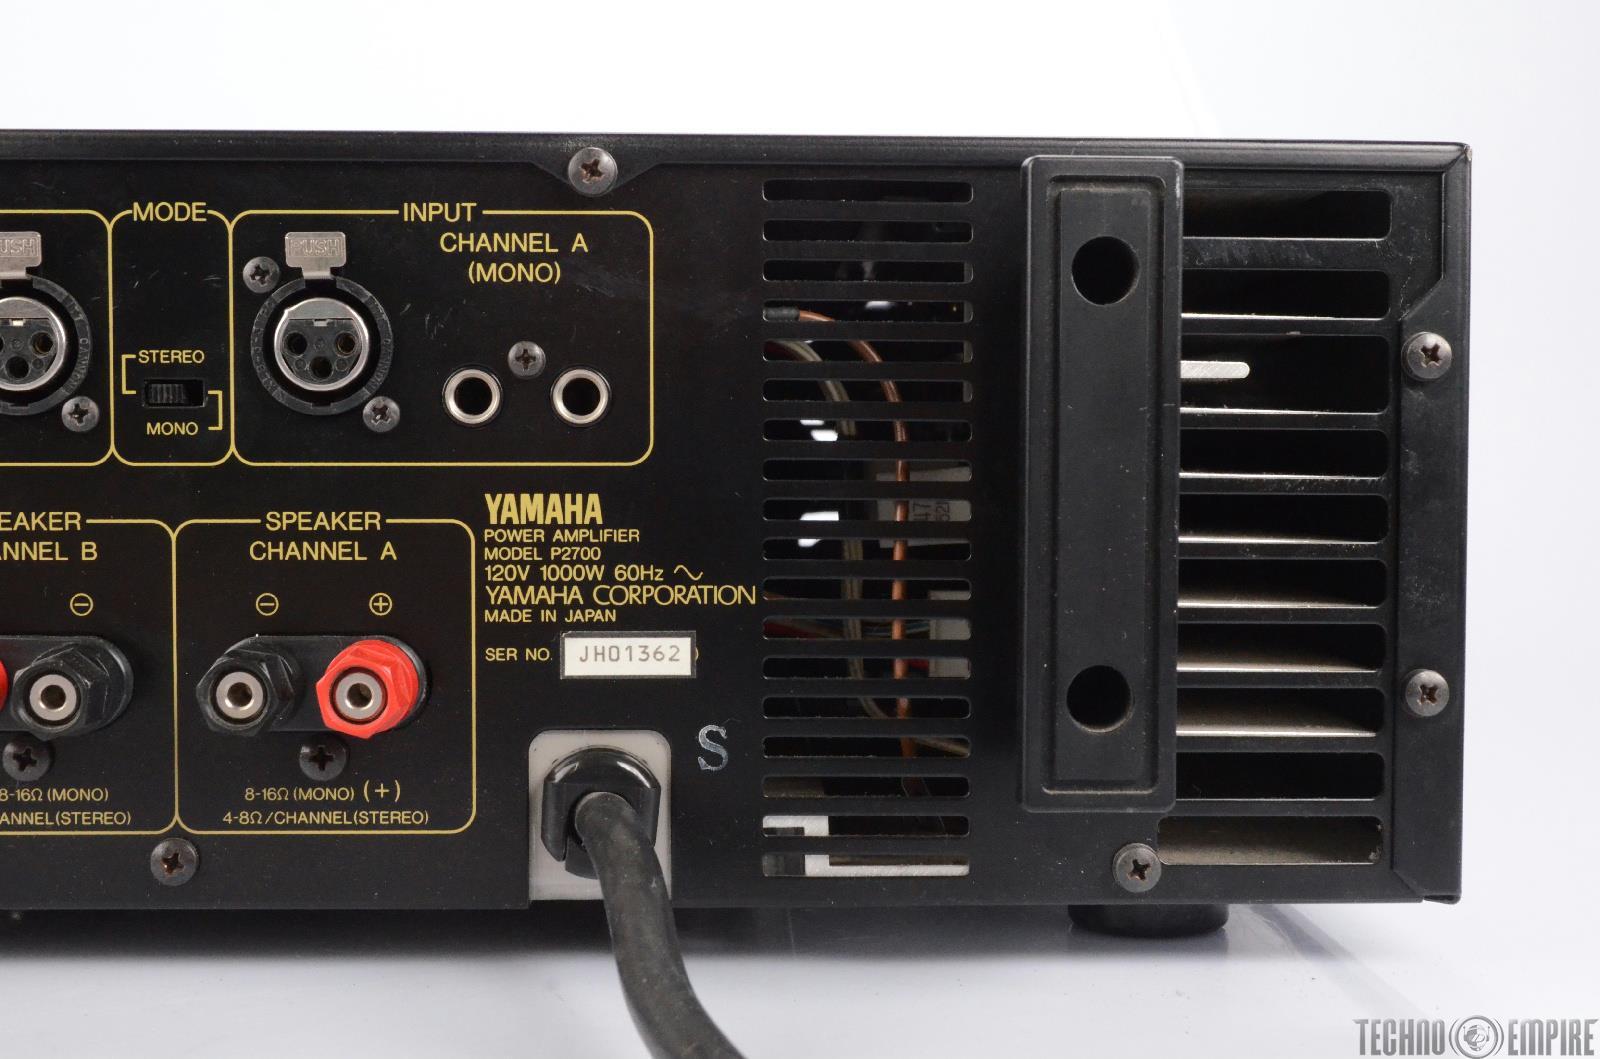 yamaha p2700 professional power amplifier amp 24352 ebay. Black Bedroom Furniture Sets. Home Design Ideas